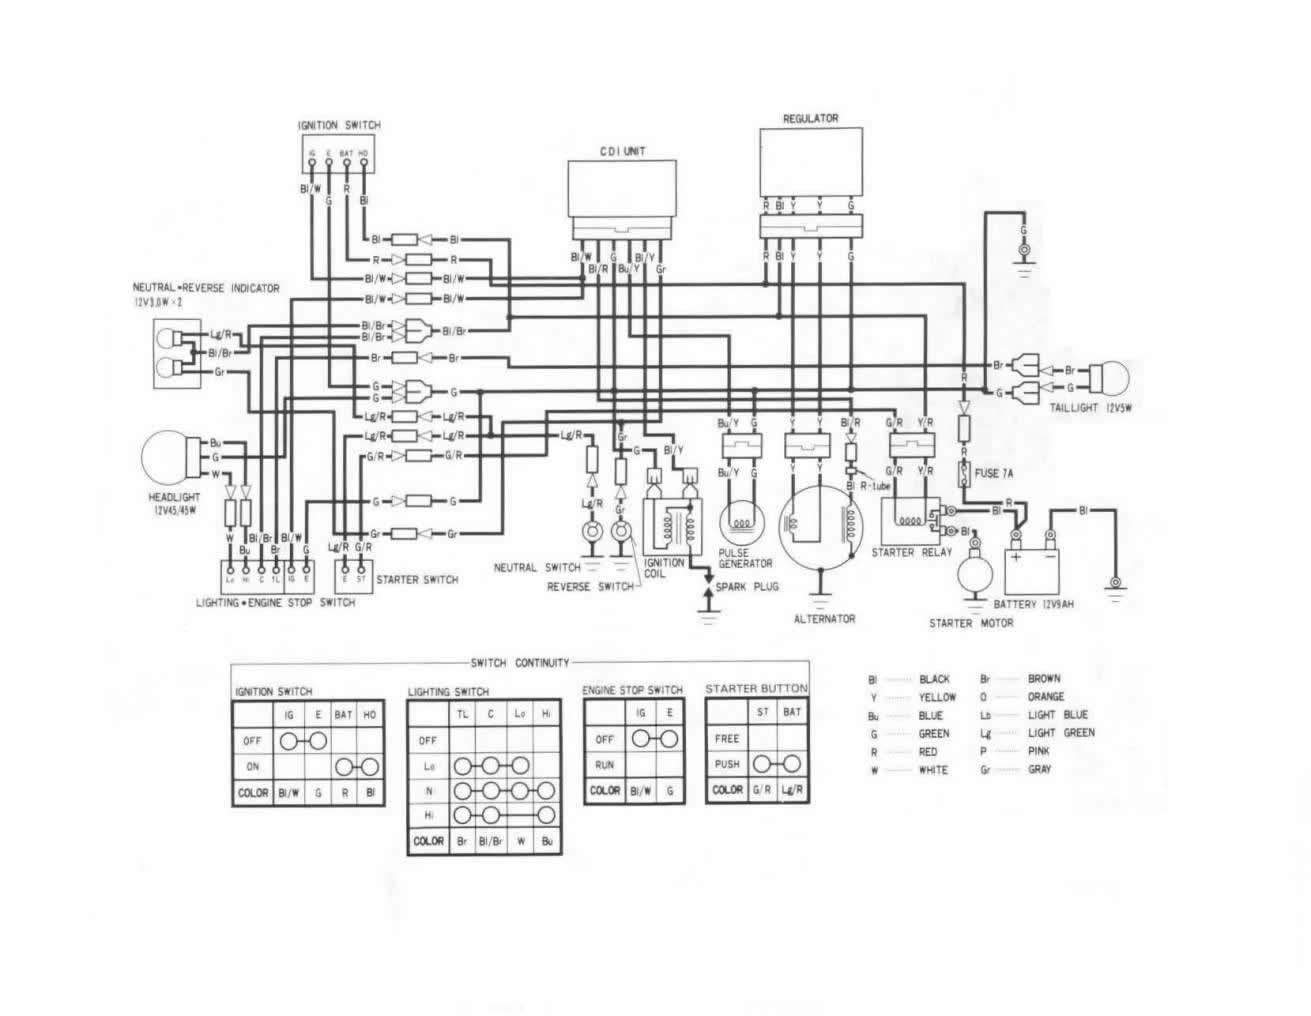 trx 350 wiring diagram 2000